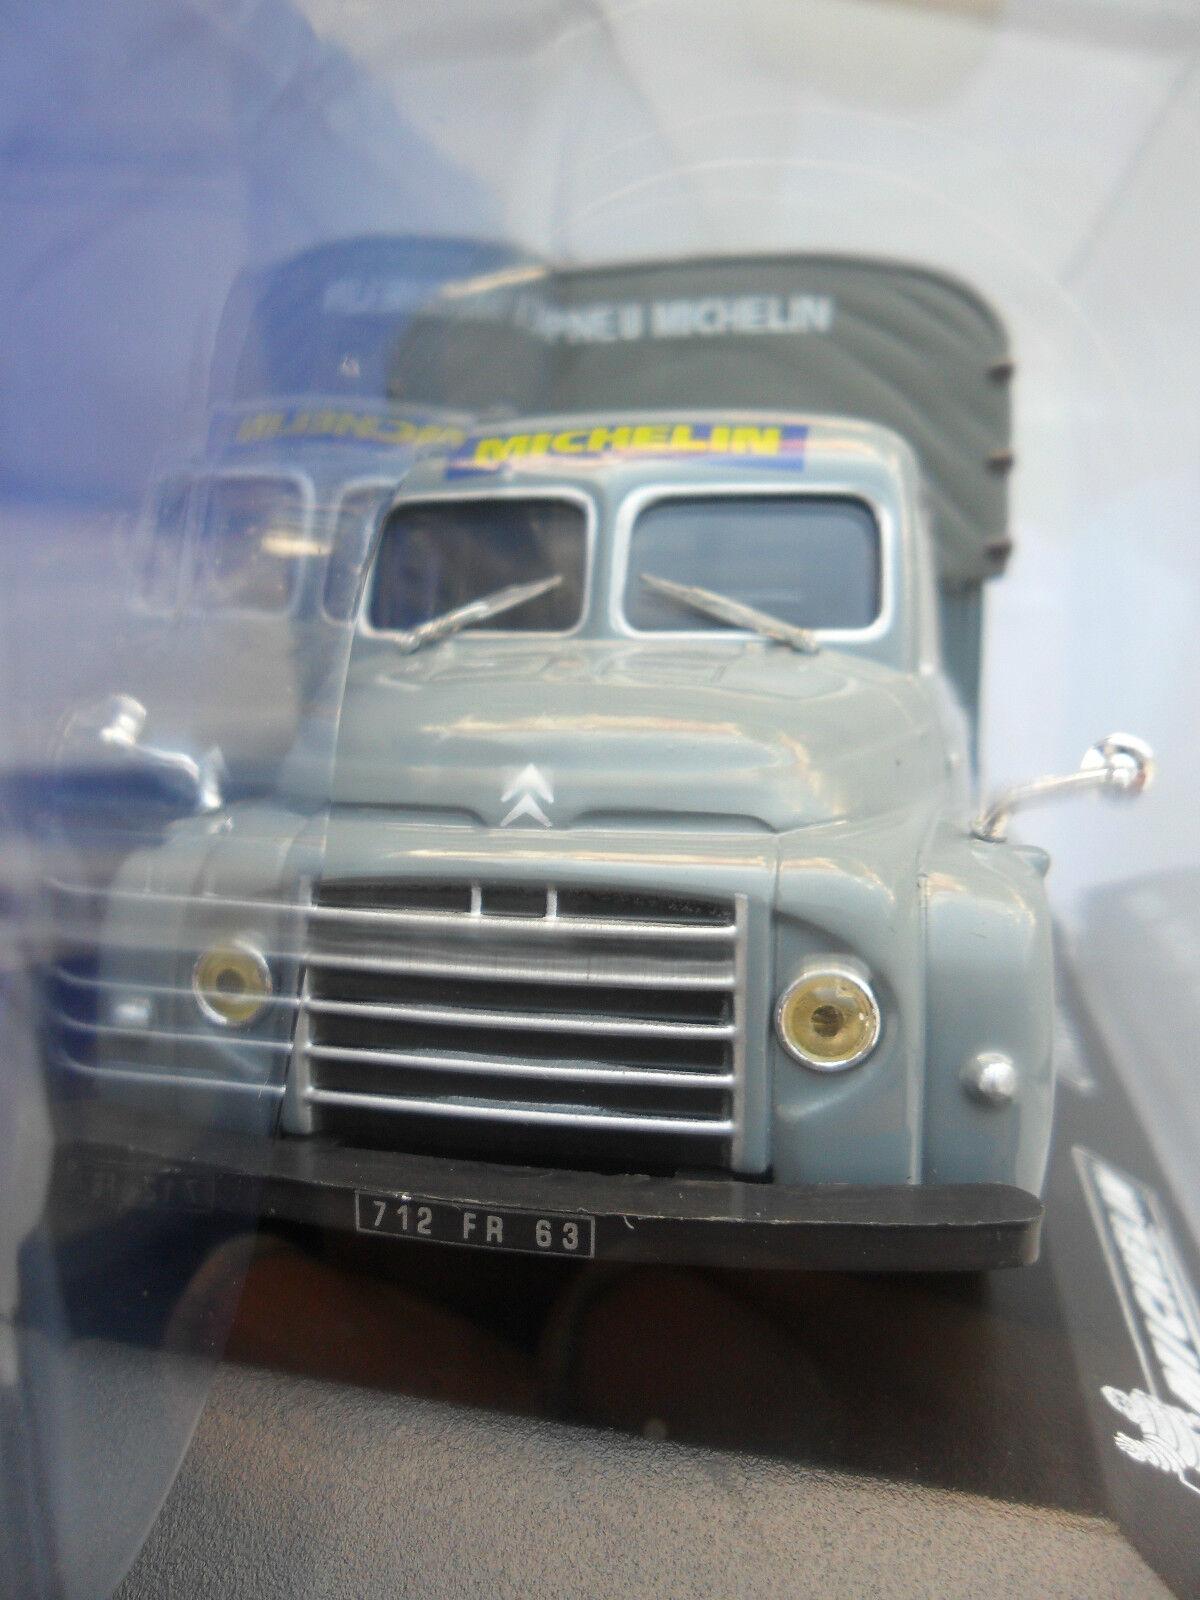 CITROEN U23 BACHE USINE MICHELIN MICHELIN MICHELIN Colección officielle diecast camión de la segunda guerra mundial 2 1 43 829070